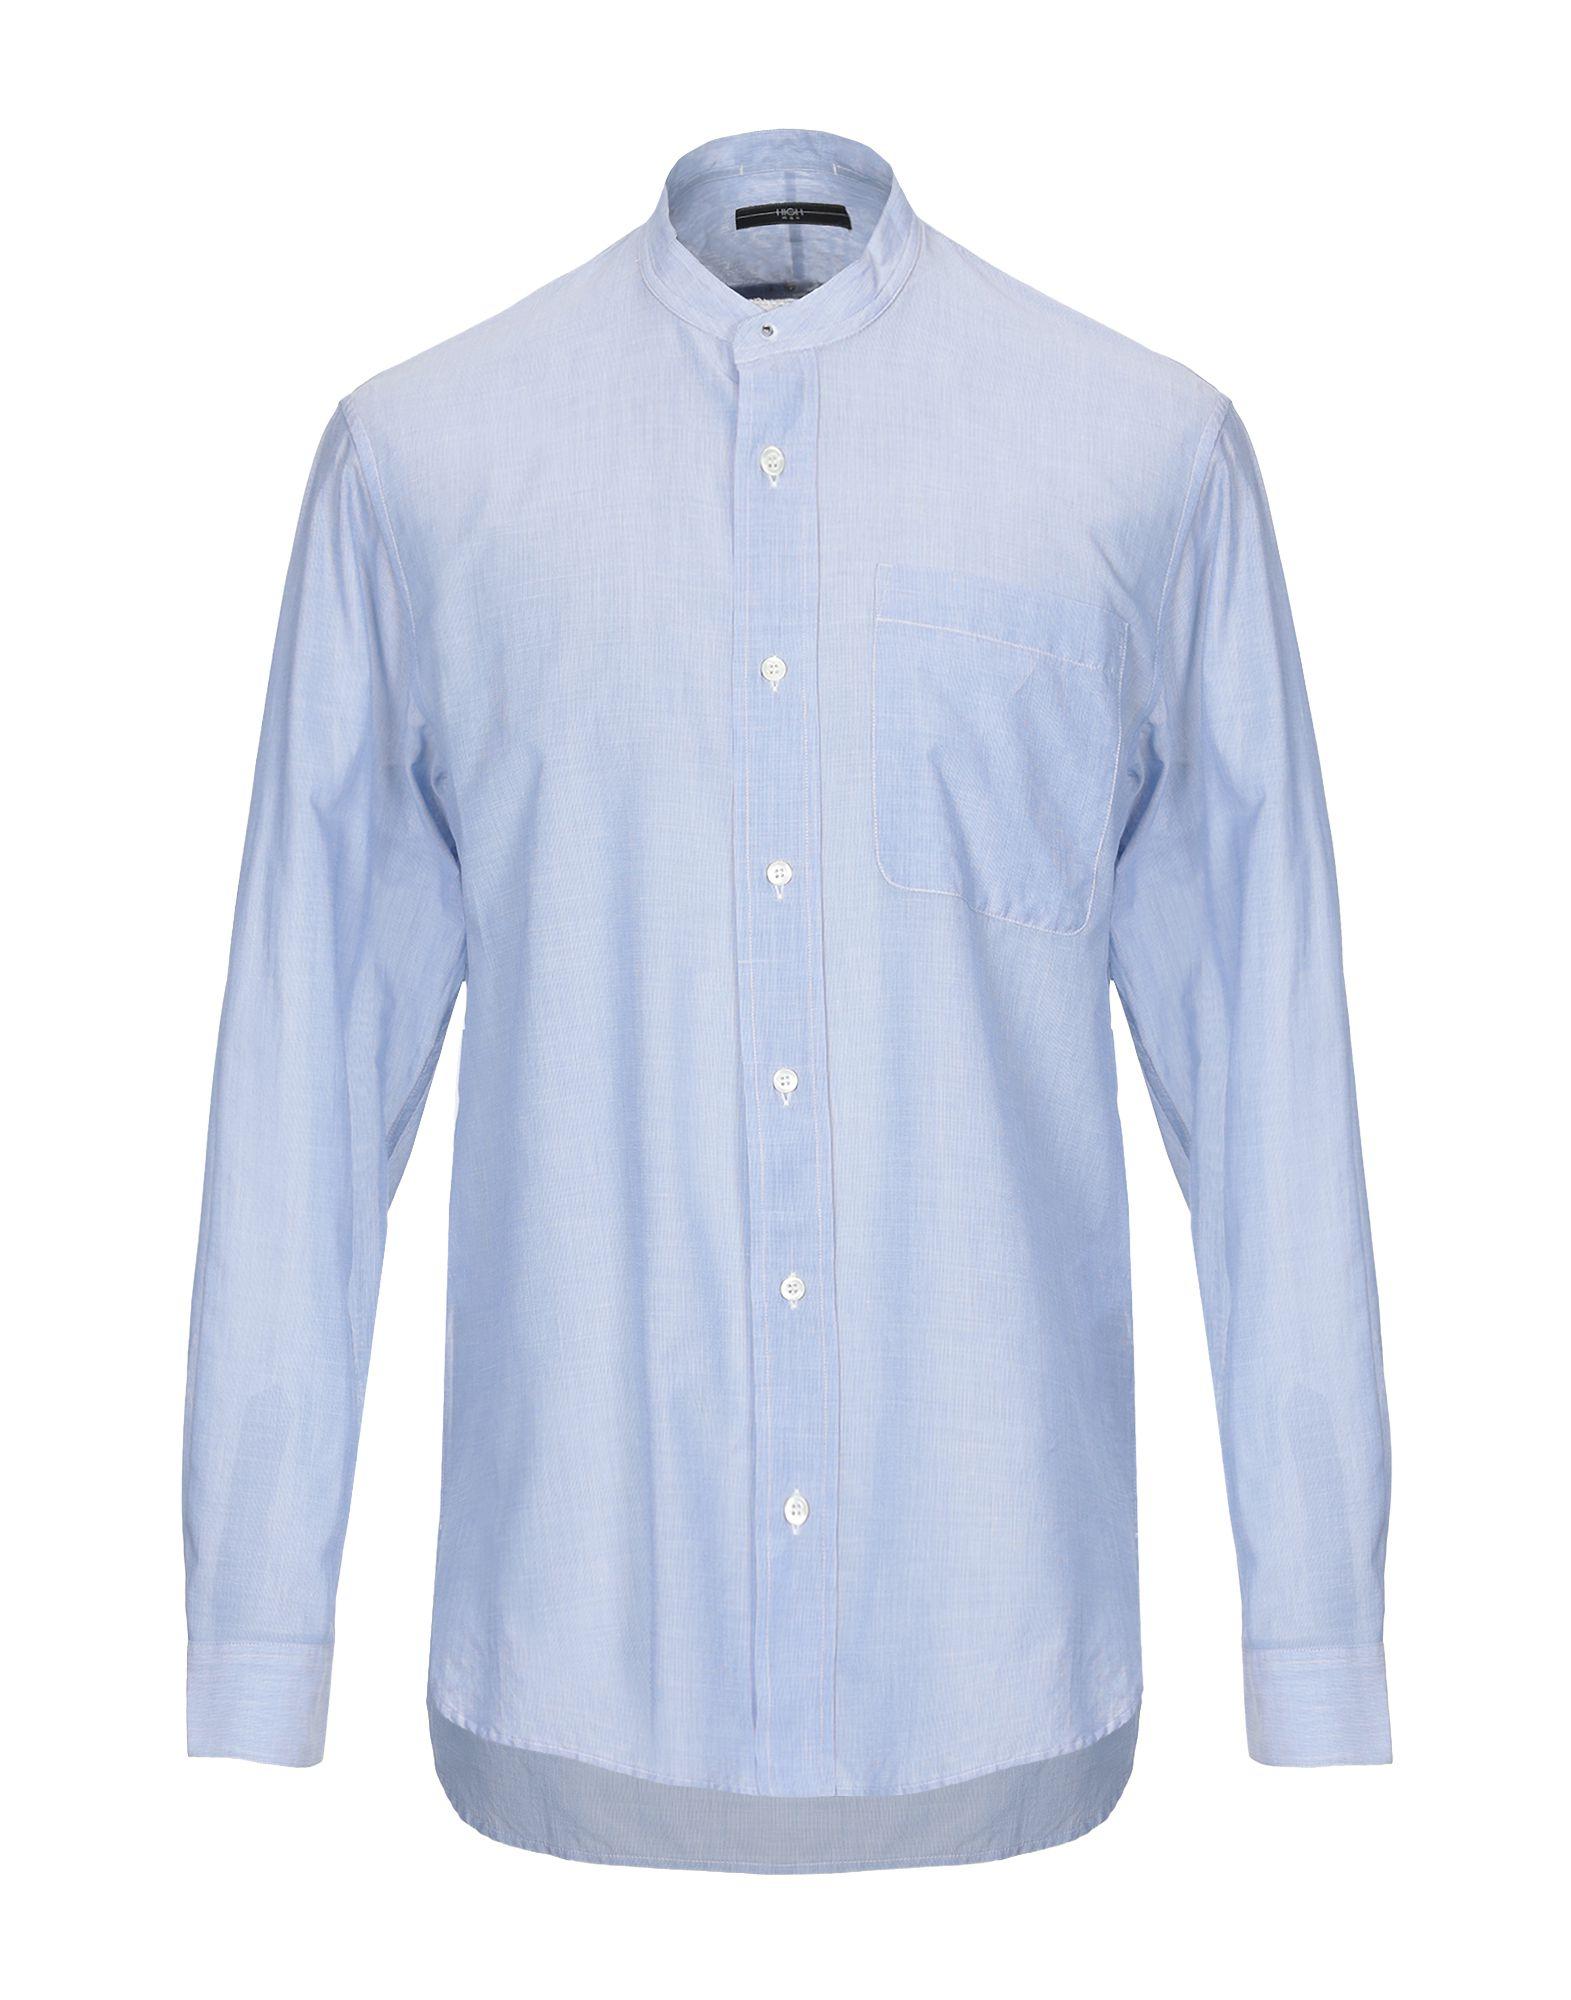 Camicia Tinta Unita High By Claire Campbell uomo uomo uomo - 38812019JM 29b